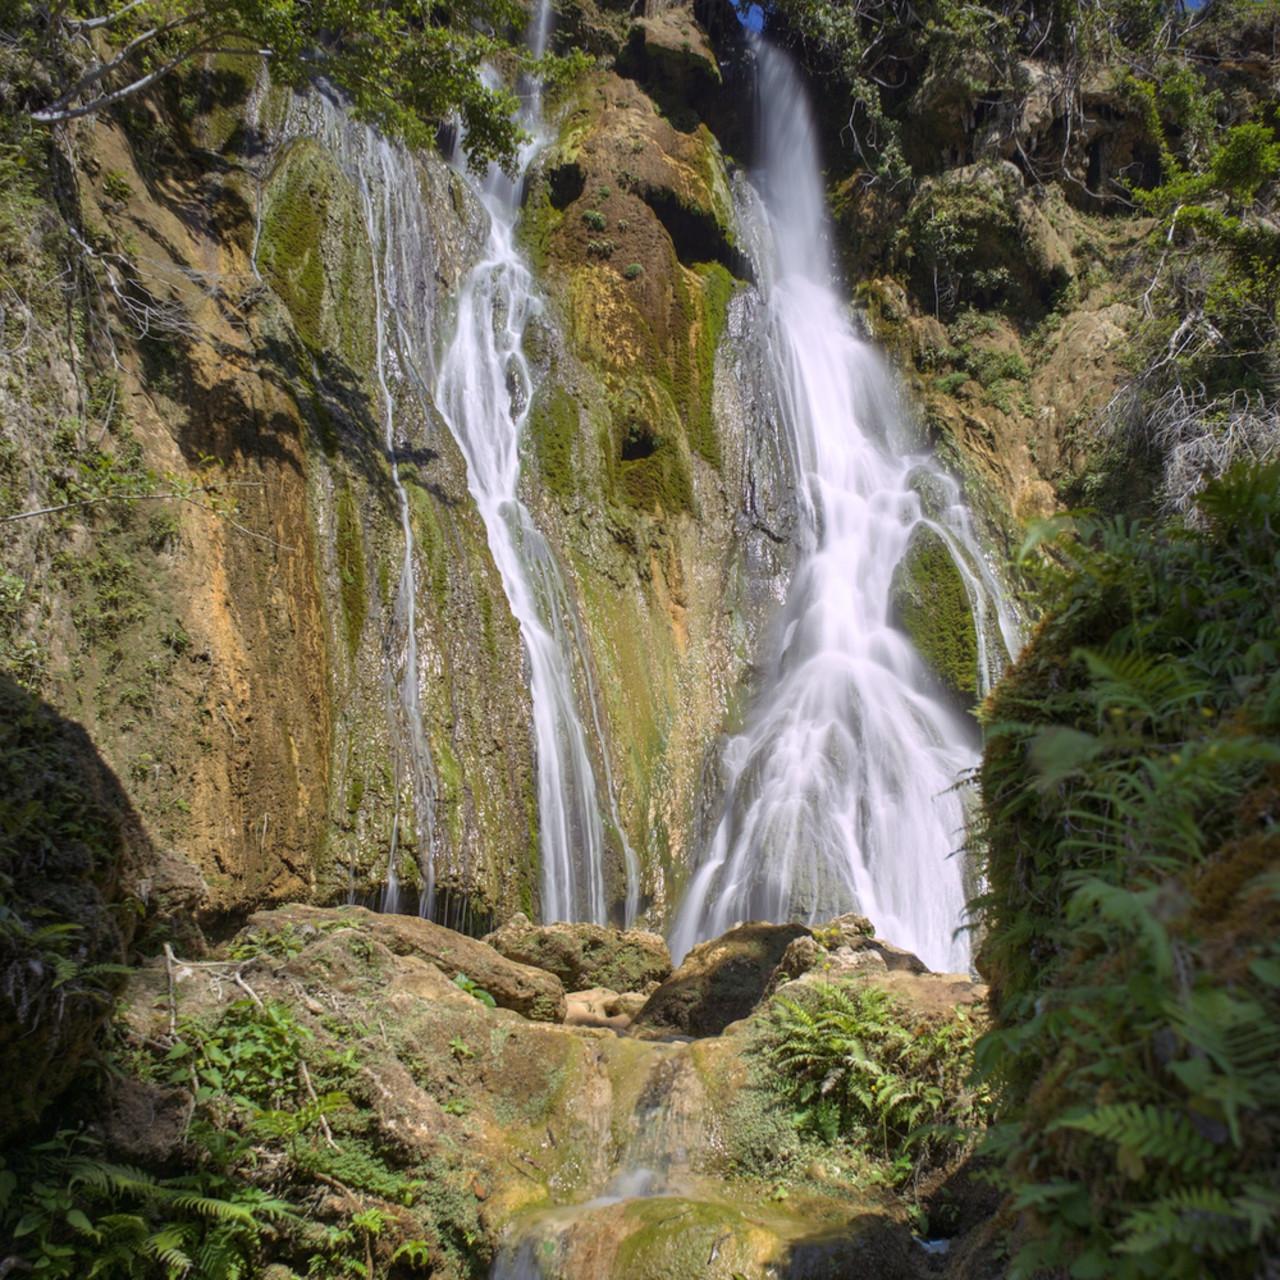 Evergreen cascades mele village port vila vanuatu waterfall nyemov